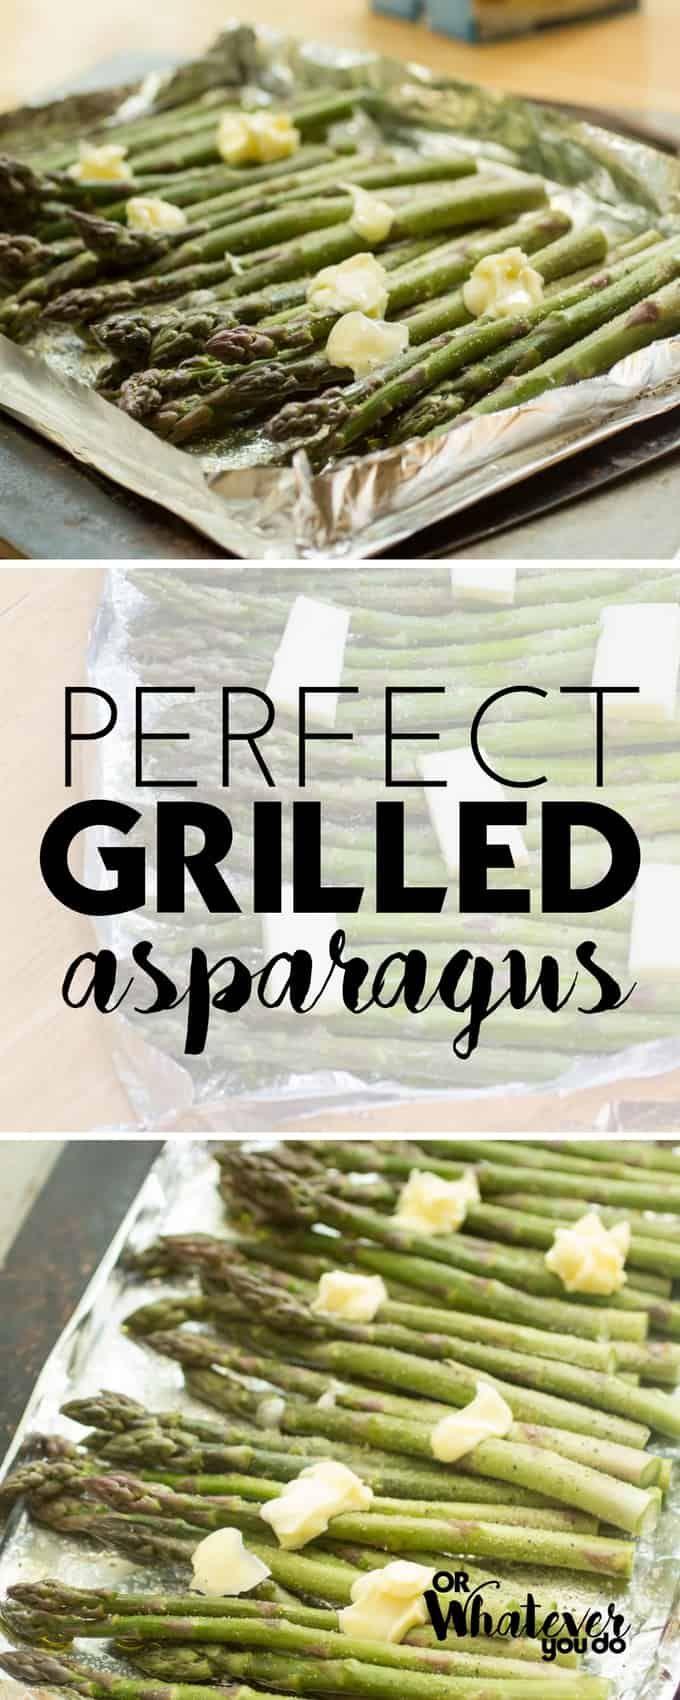 Easy, delicious, grilled asparagus! #bhgfood #buzzfeast #buzzfeedfood #cookinglight #delicious #dining #eeeats #eeeeeats #f52grams #feedfeed #food52 #food52gram #foodblogeats #foodbloggeed #foodblogger #foodgawker #foodie #foodlove #foodpic #foodstagram #forkyeah #gloobyfood #huffpostfeed #huffposttaste #igdaily #instafeed #instafood #instayum #nomnomnom #traeger